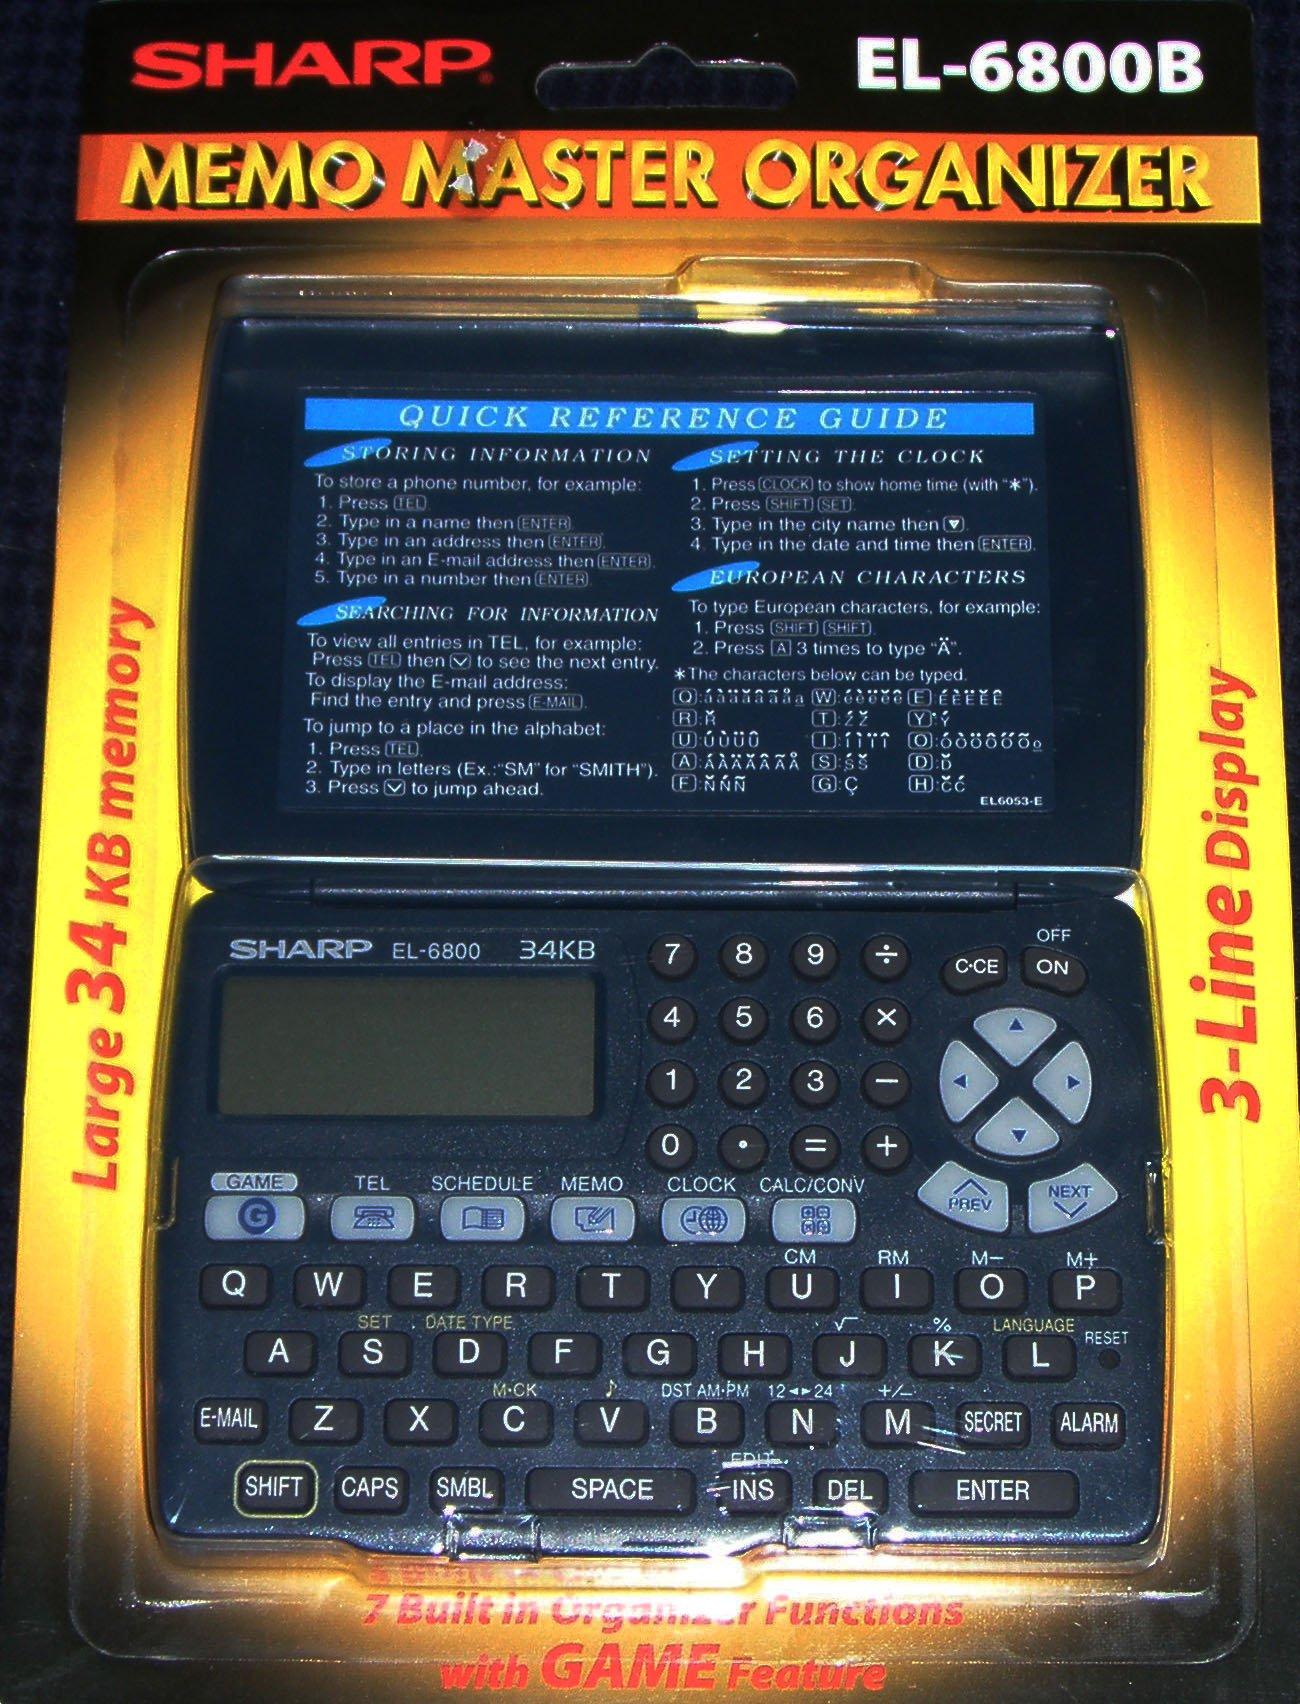 Memo Master Electronic Organizer by Sharp